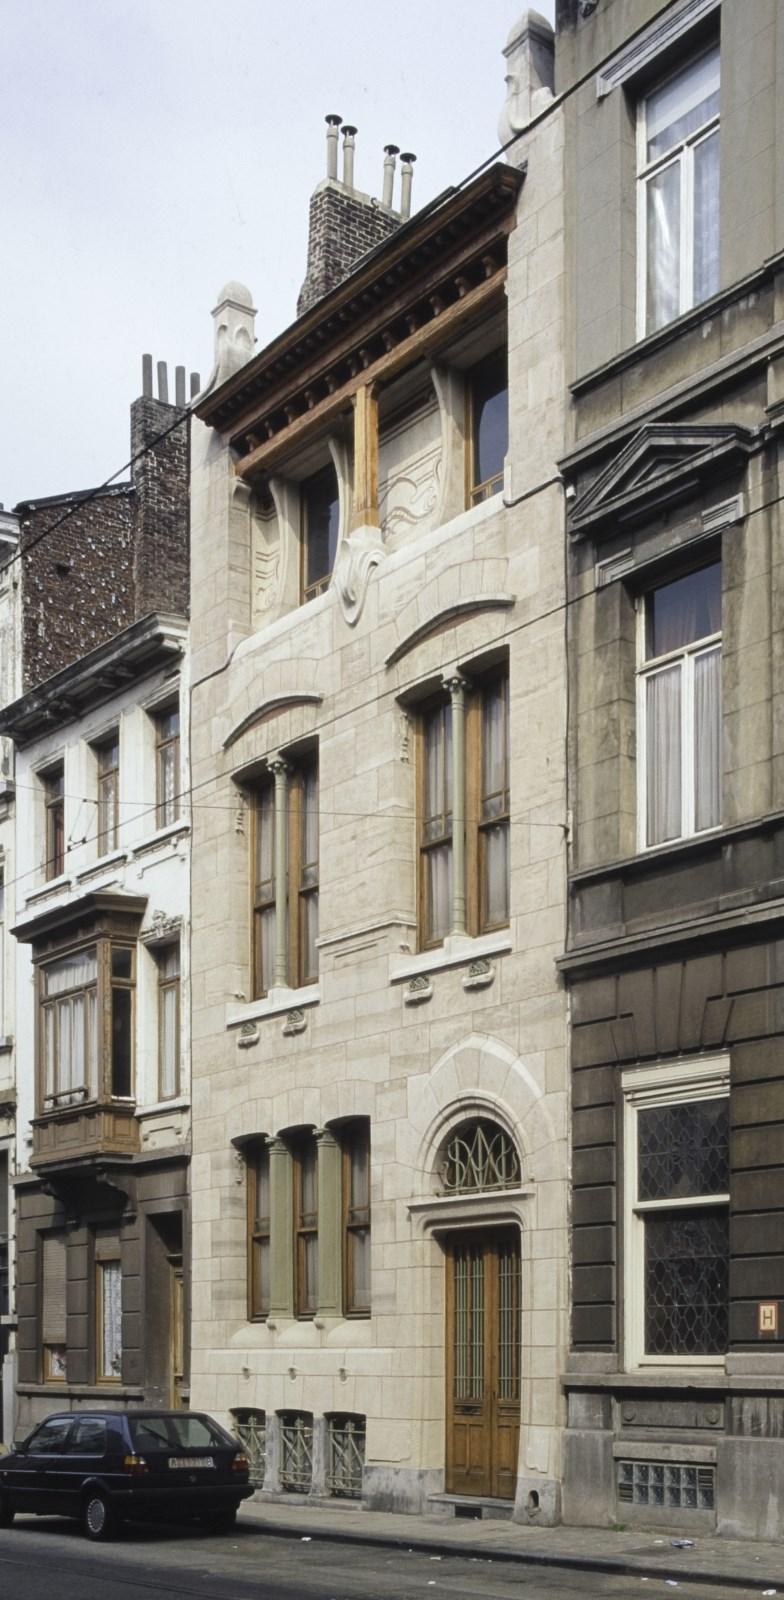 Haachtsesteenweg 266, Autriquehuis© (Foto Ch. Bastin & J. Evrard © MBHG)